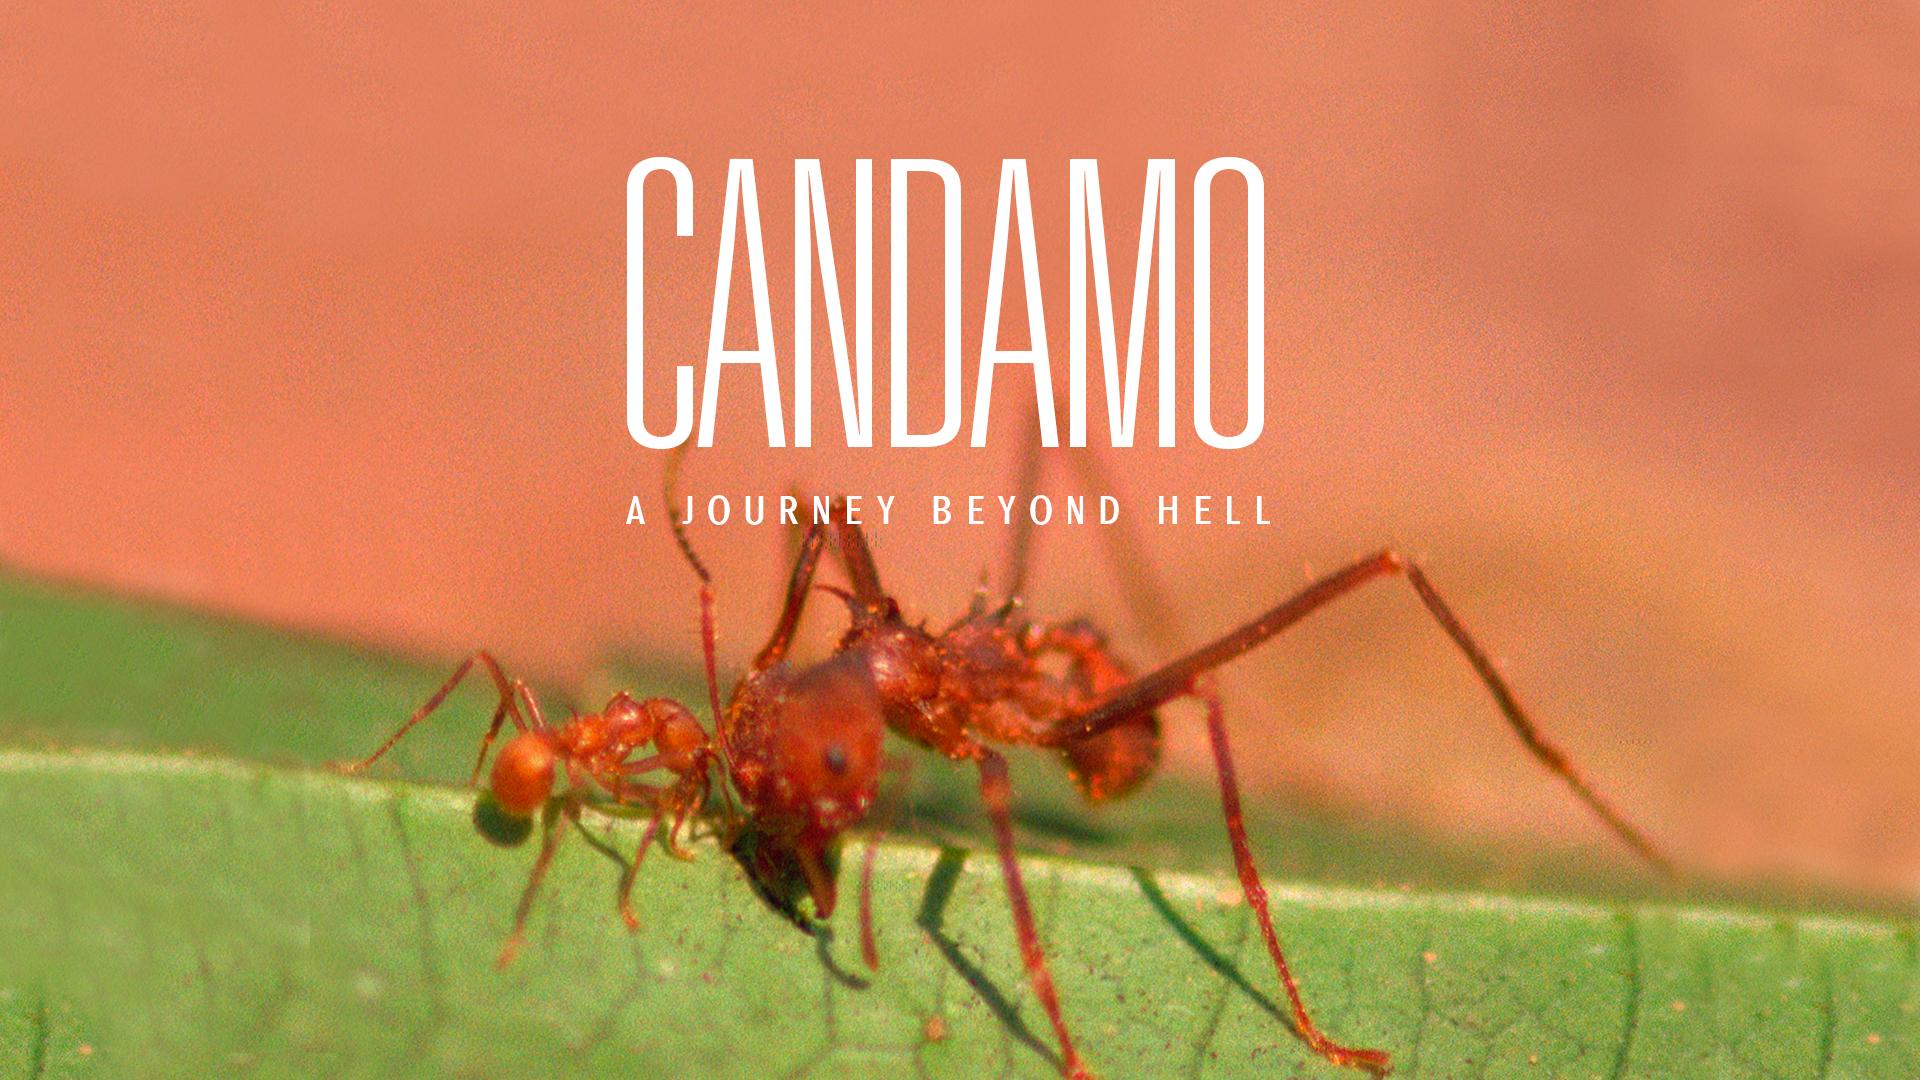 Candamo: Journey Beyond Hell